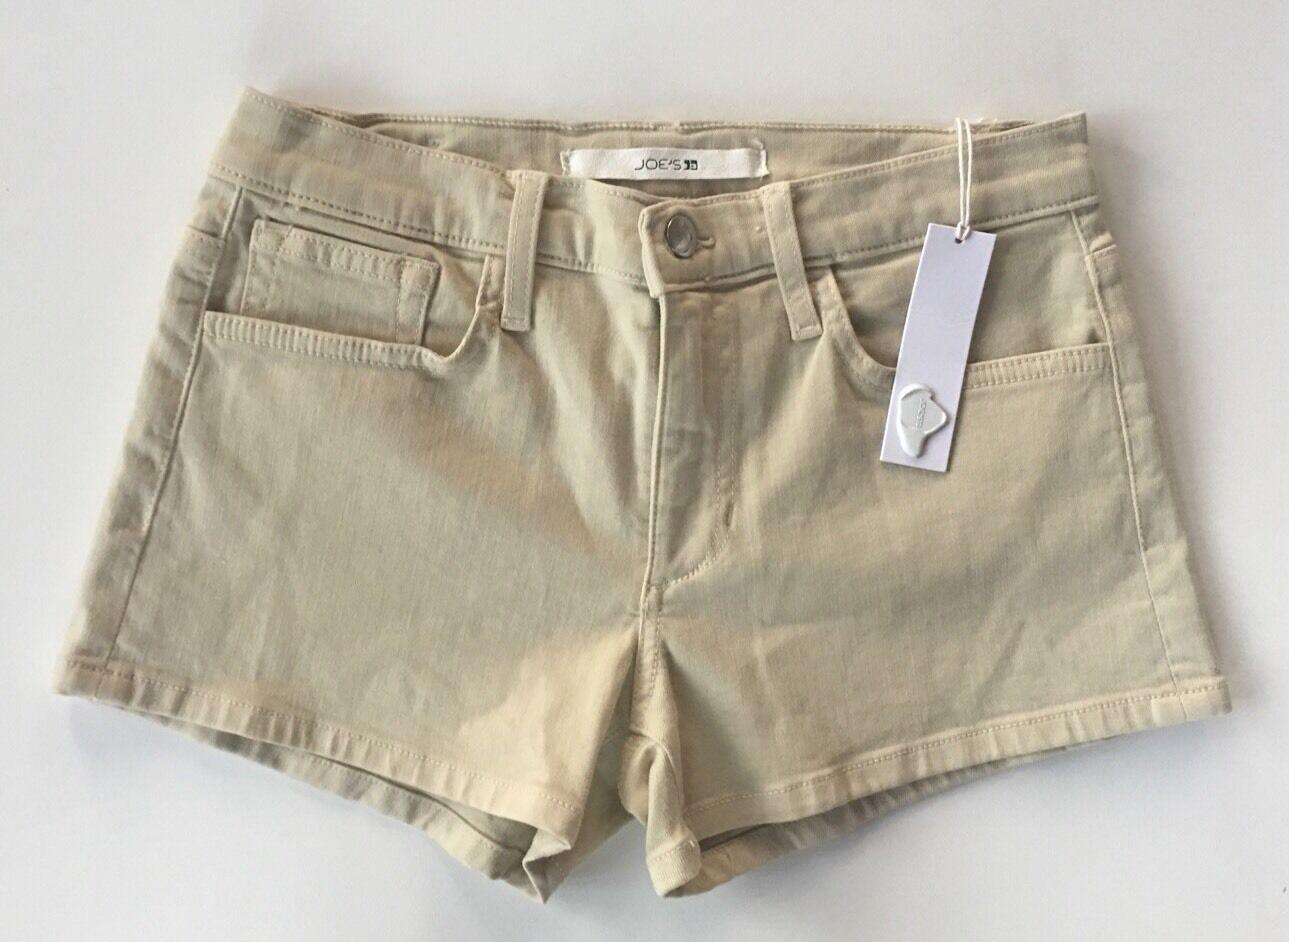 Women's Joe's Jeans Light Stone Beige 3  Denim Shorts-Sz 27 (run small)